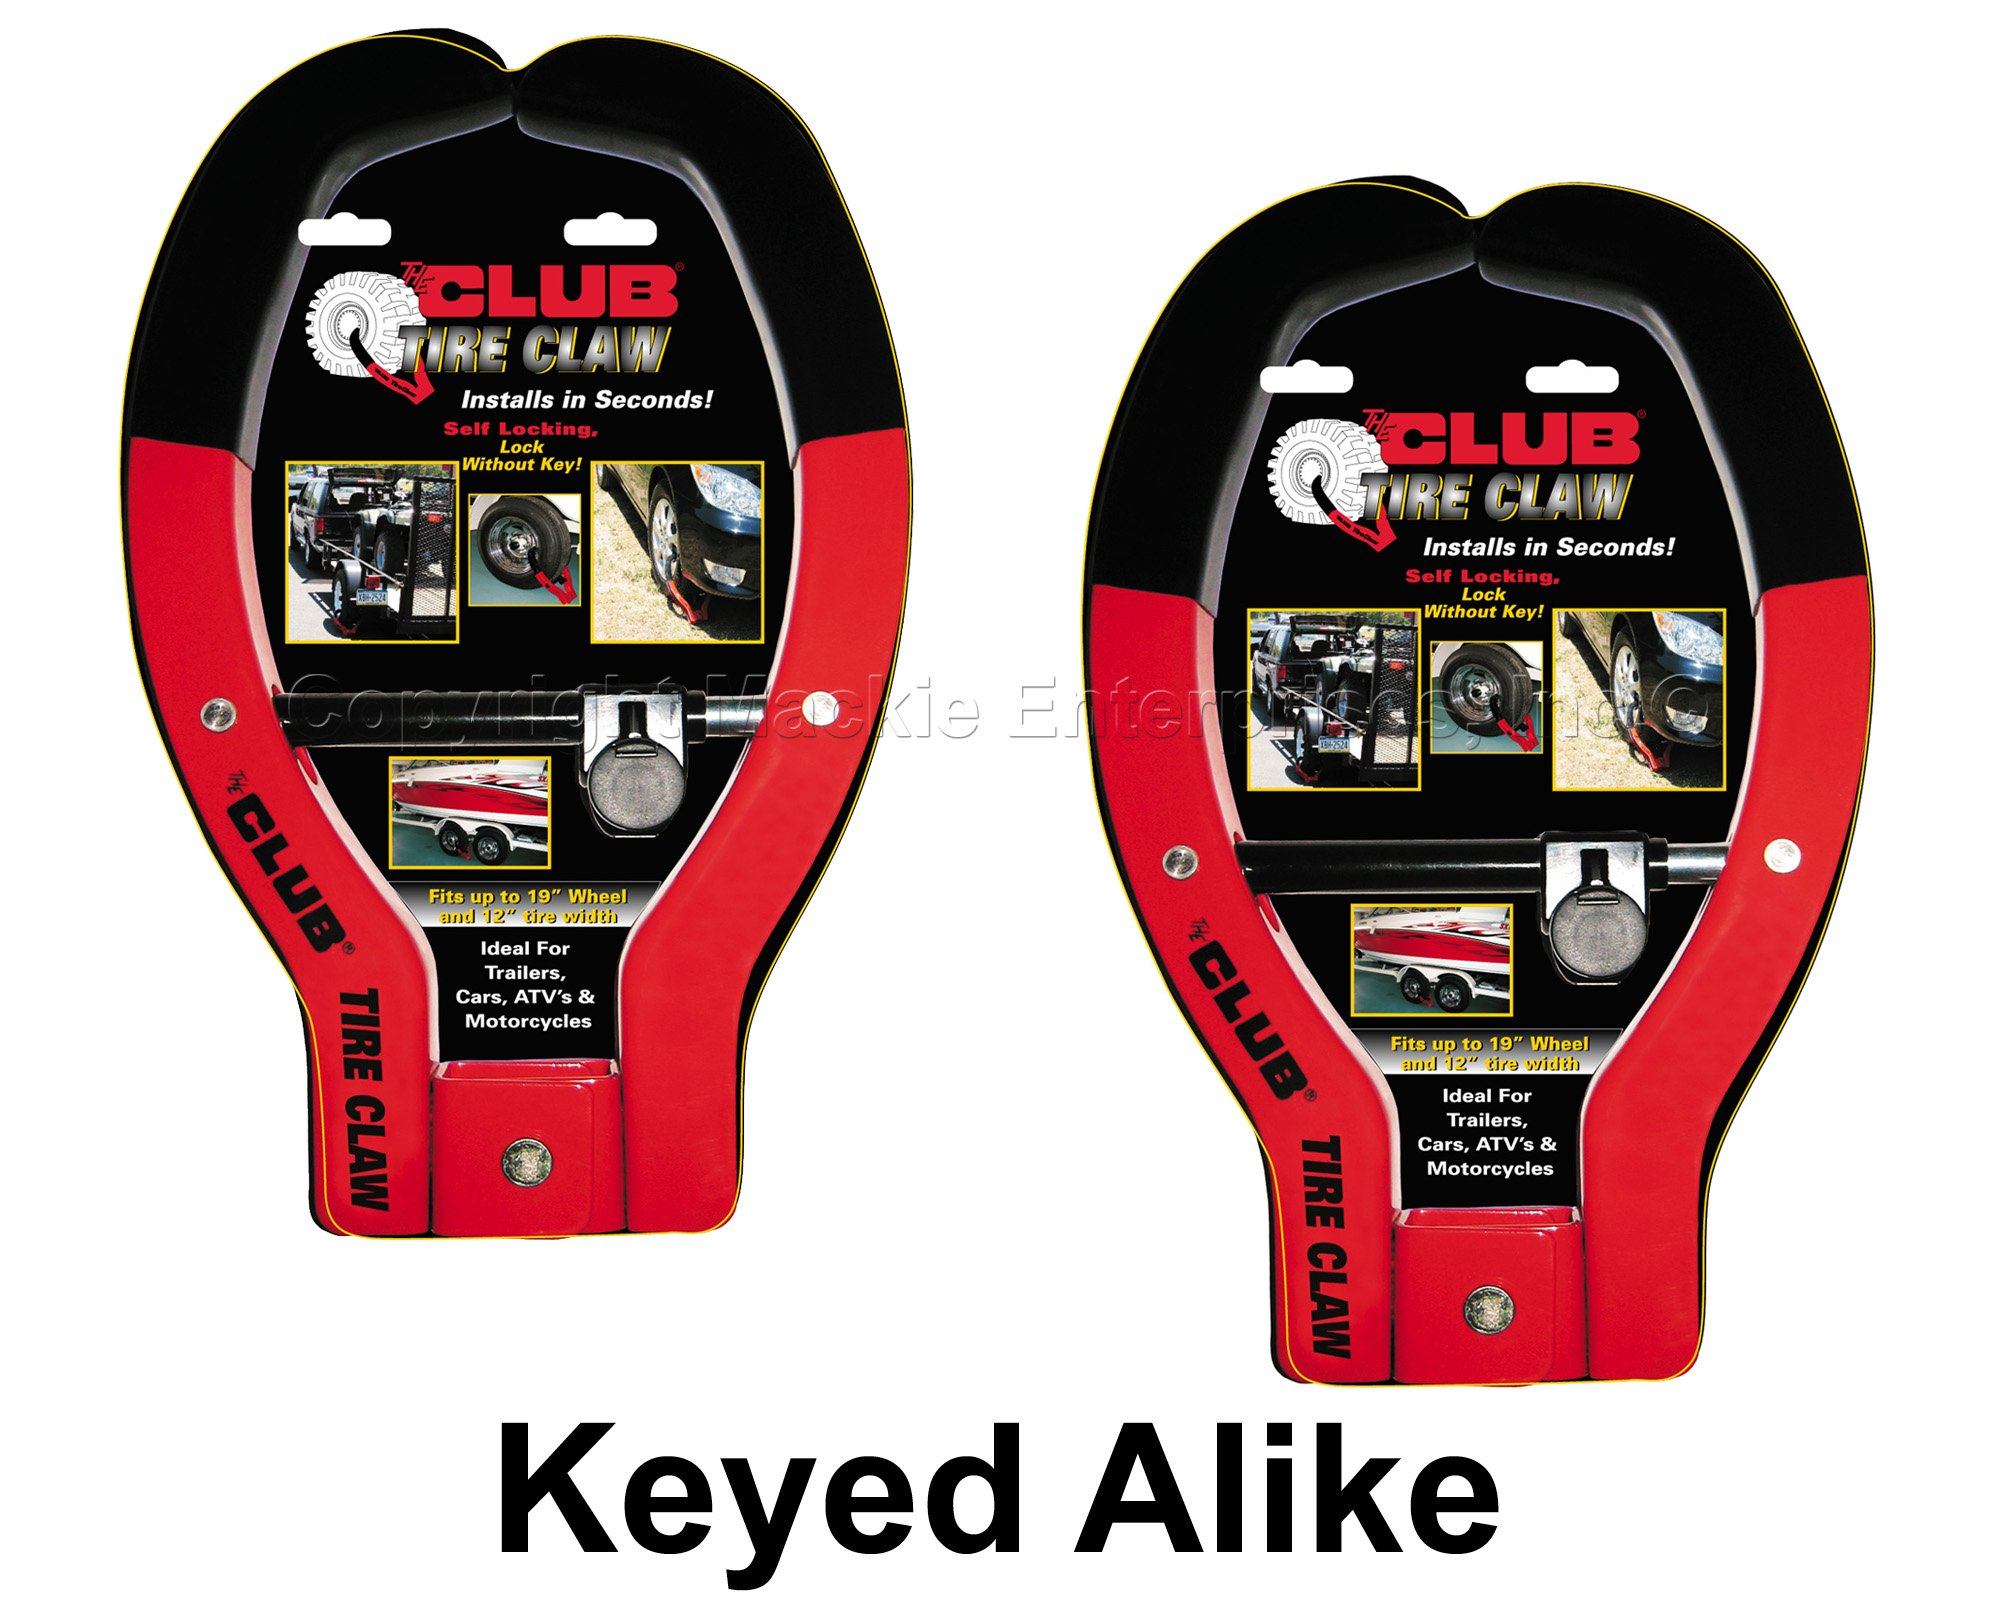 Tire Claw XL Lock - ATV, Auto, Trailer Locks #491KA-2